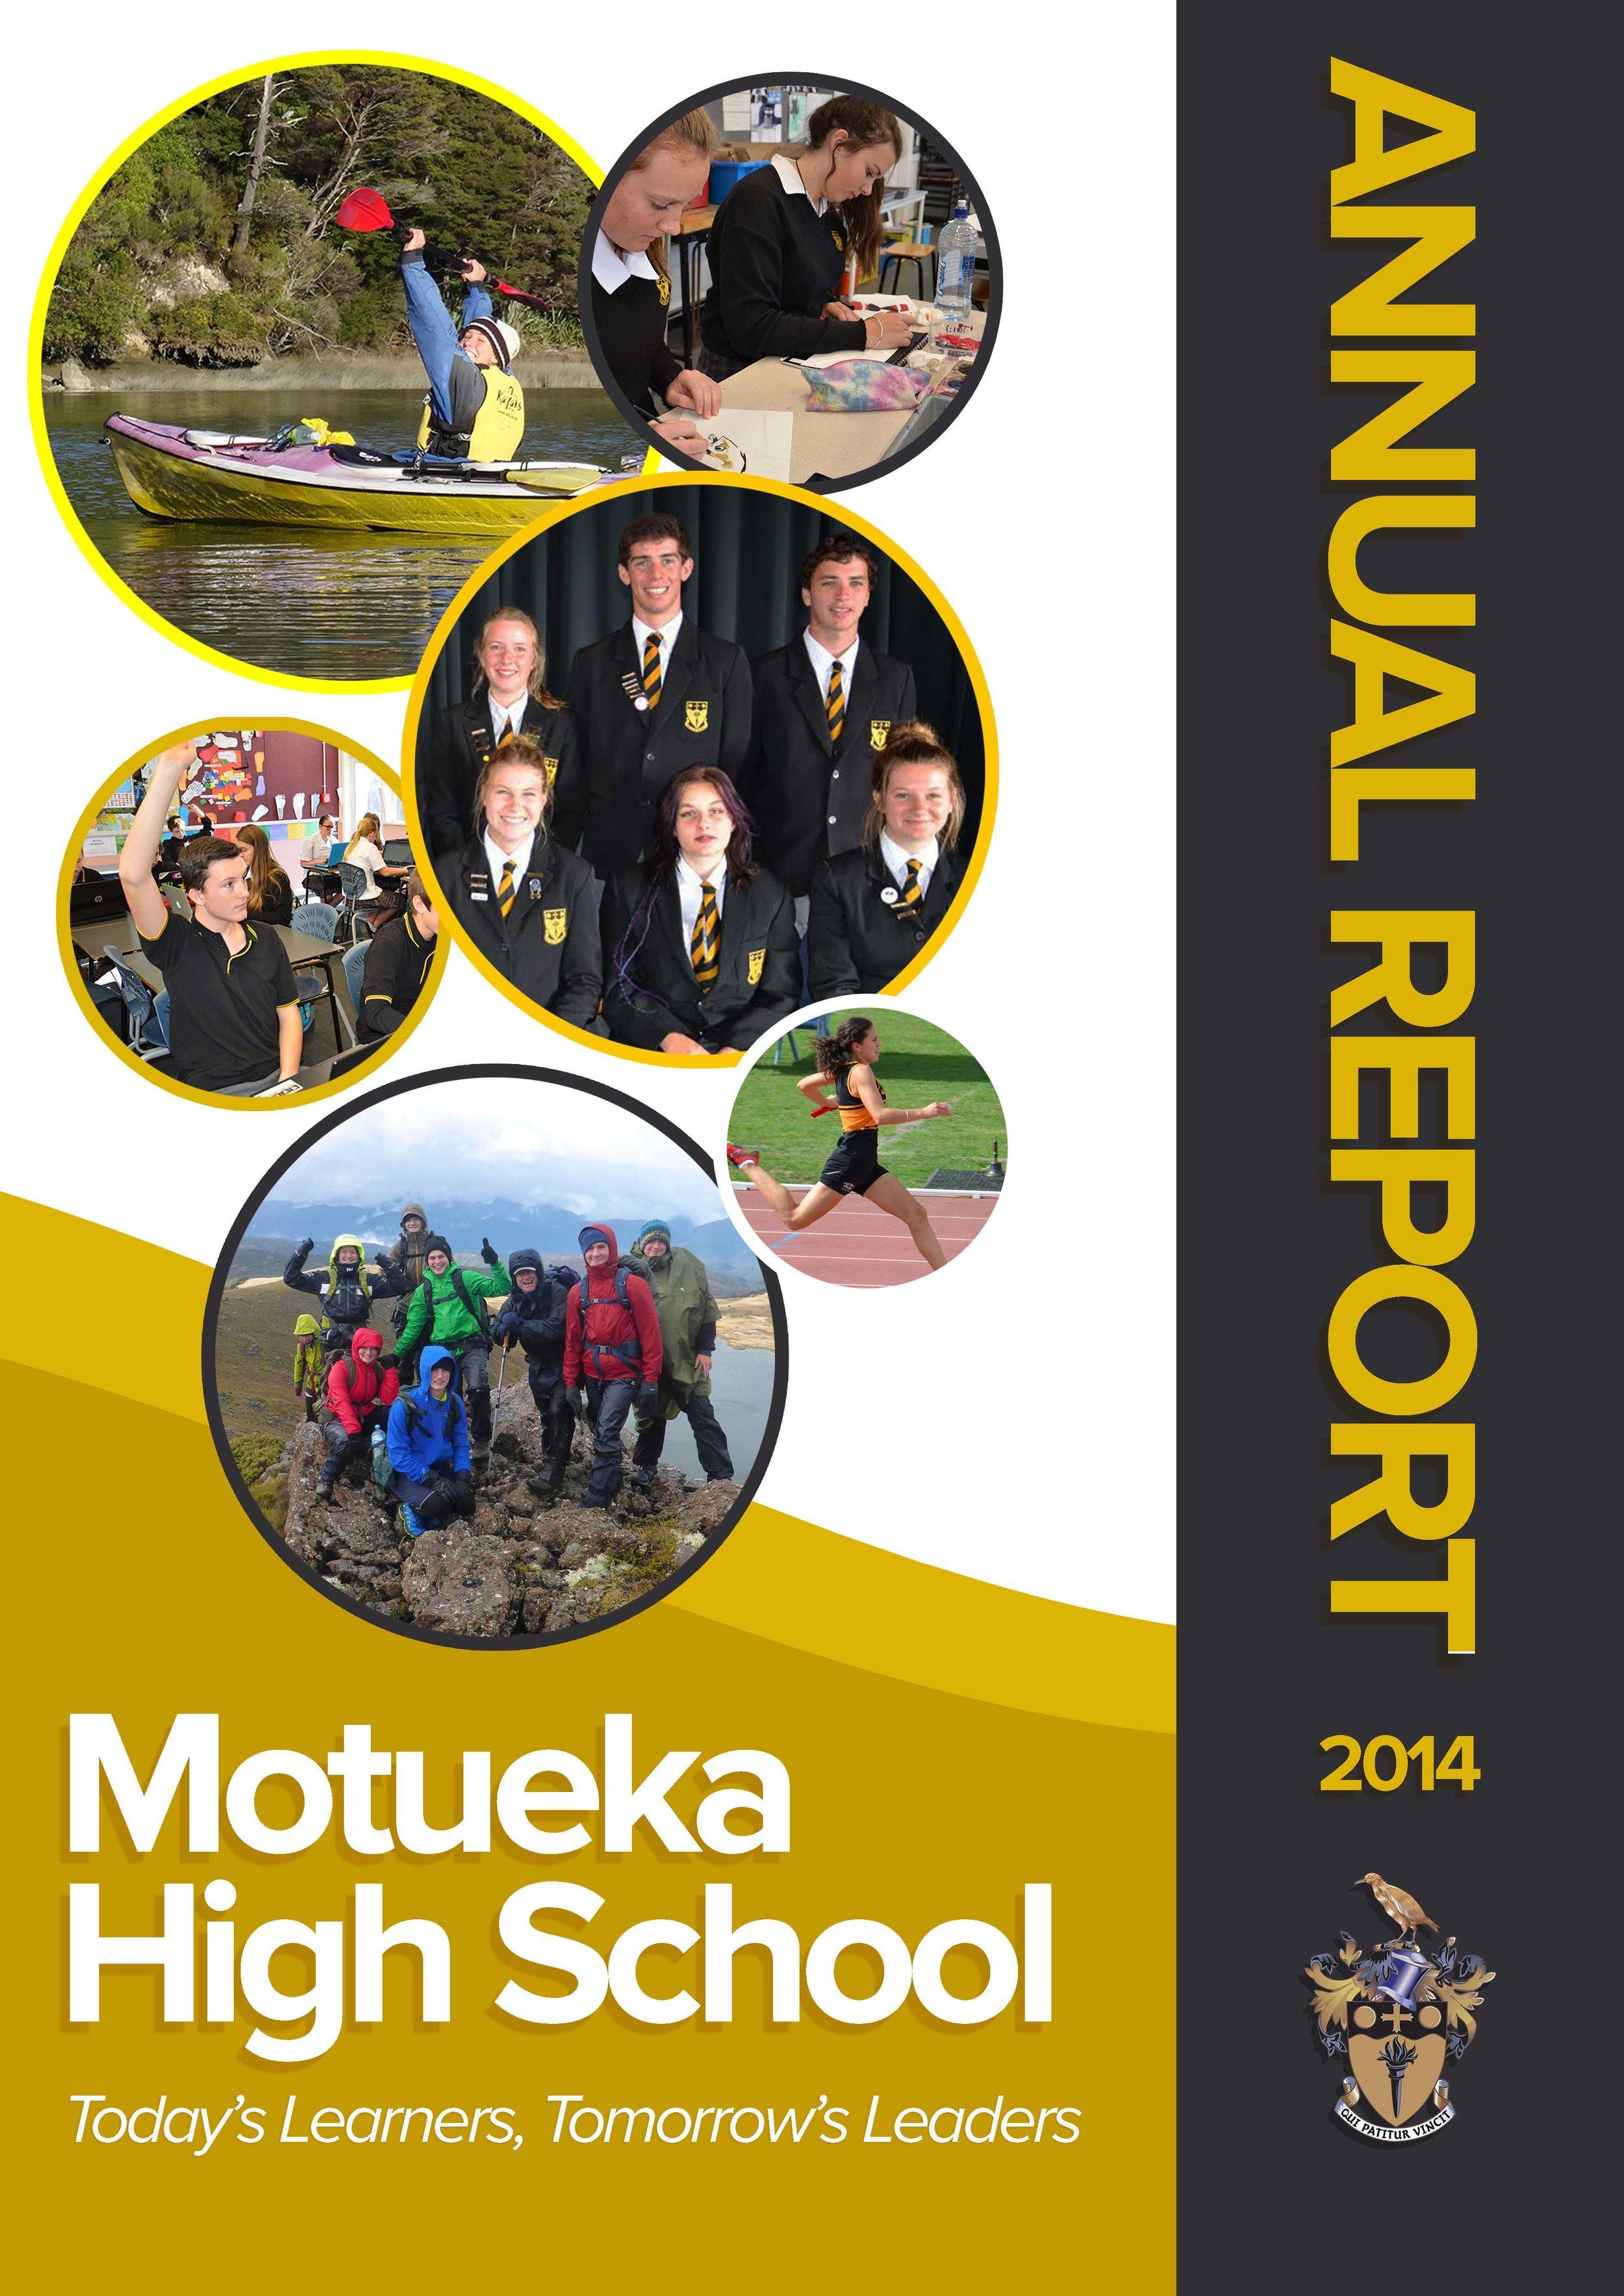 Redevelopment of Motueka High School identity